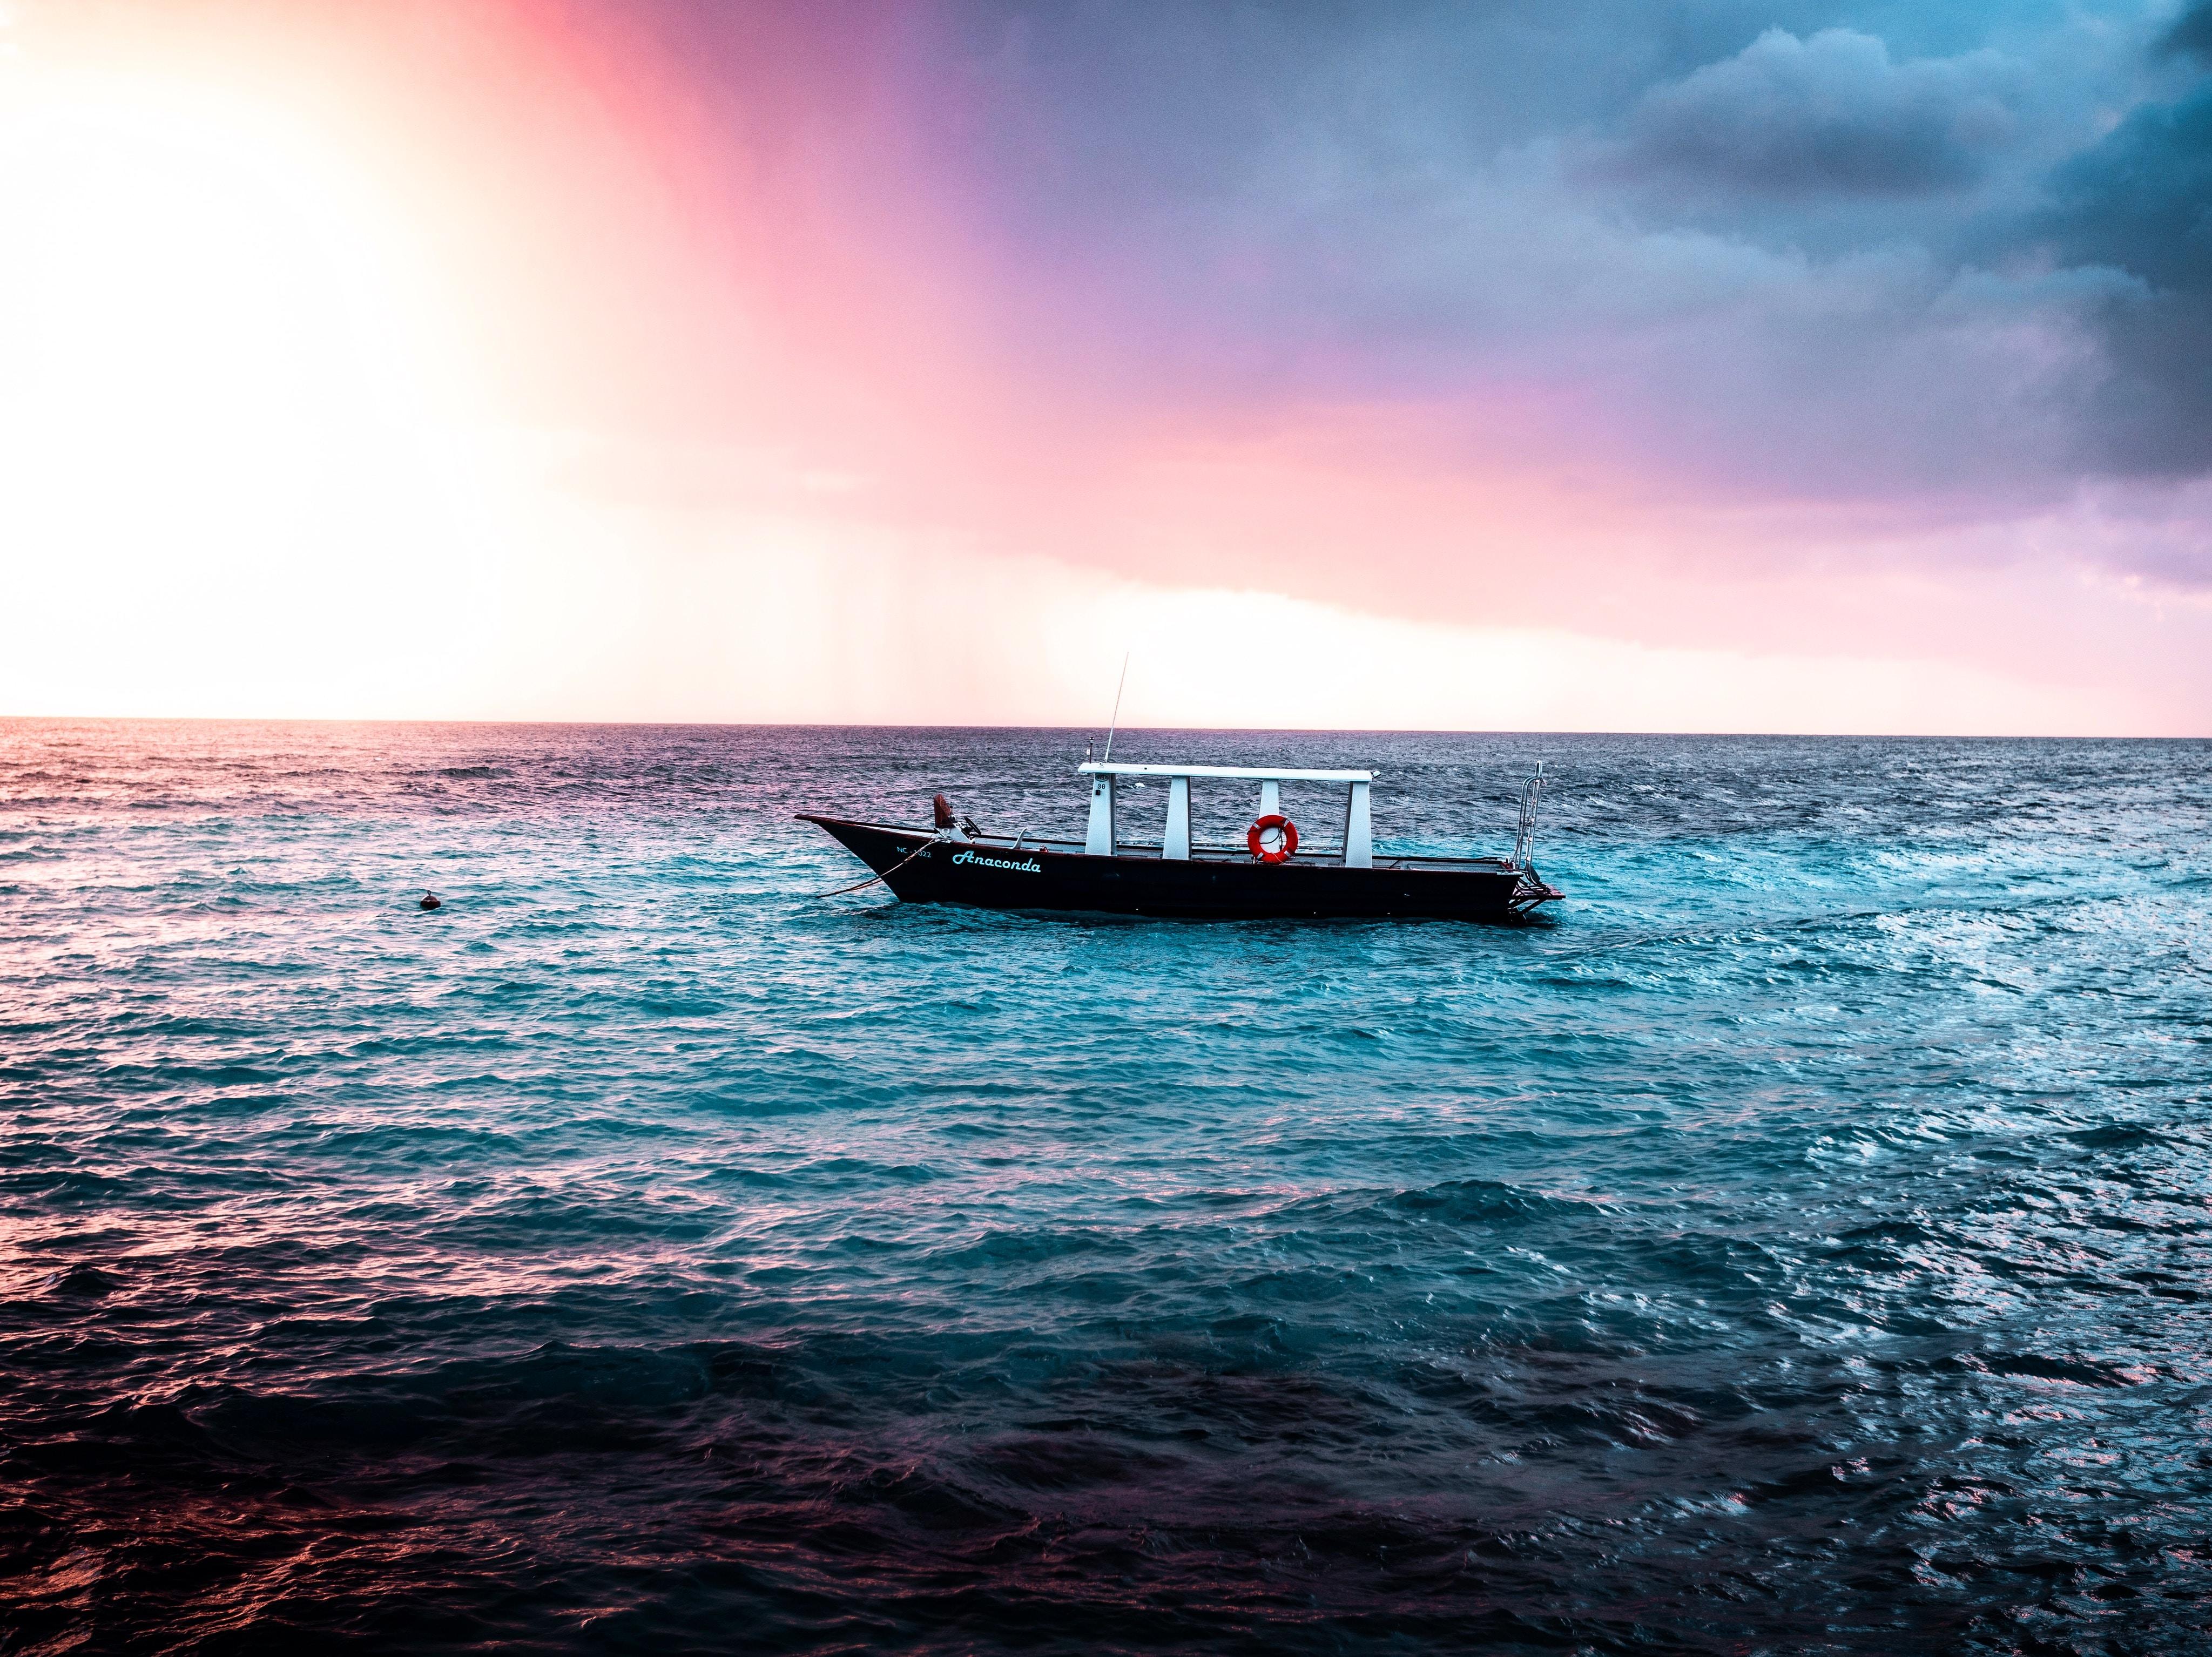 empty boat on the sea